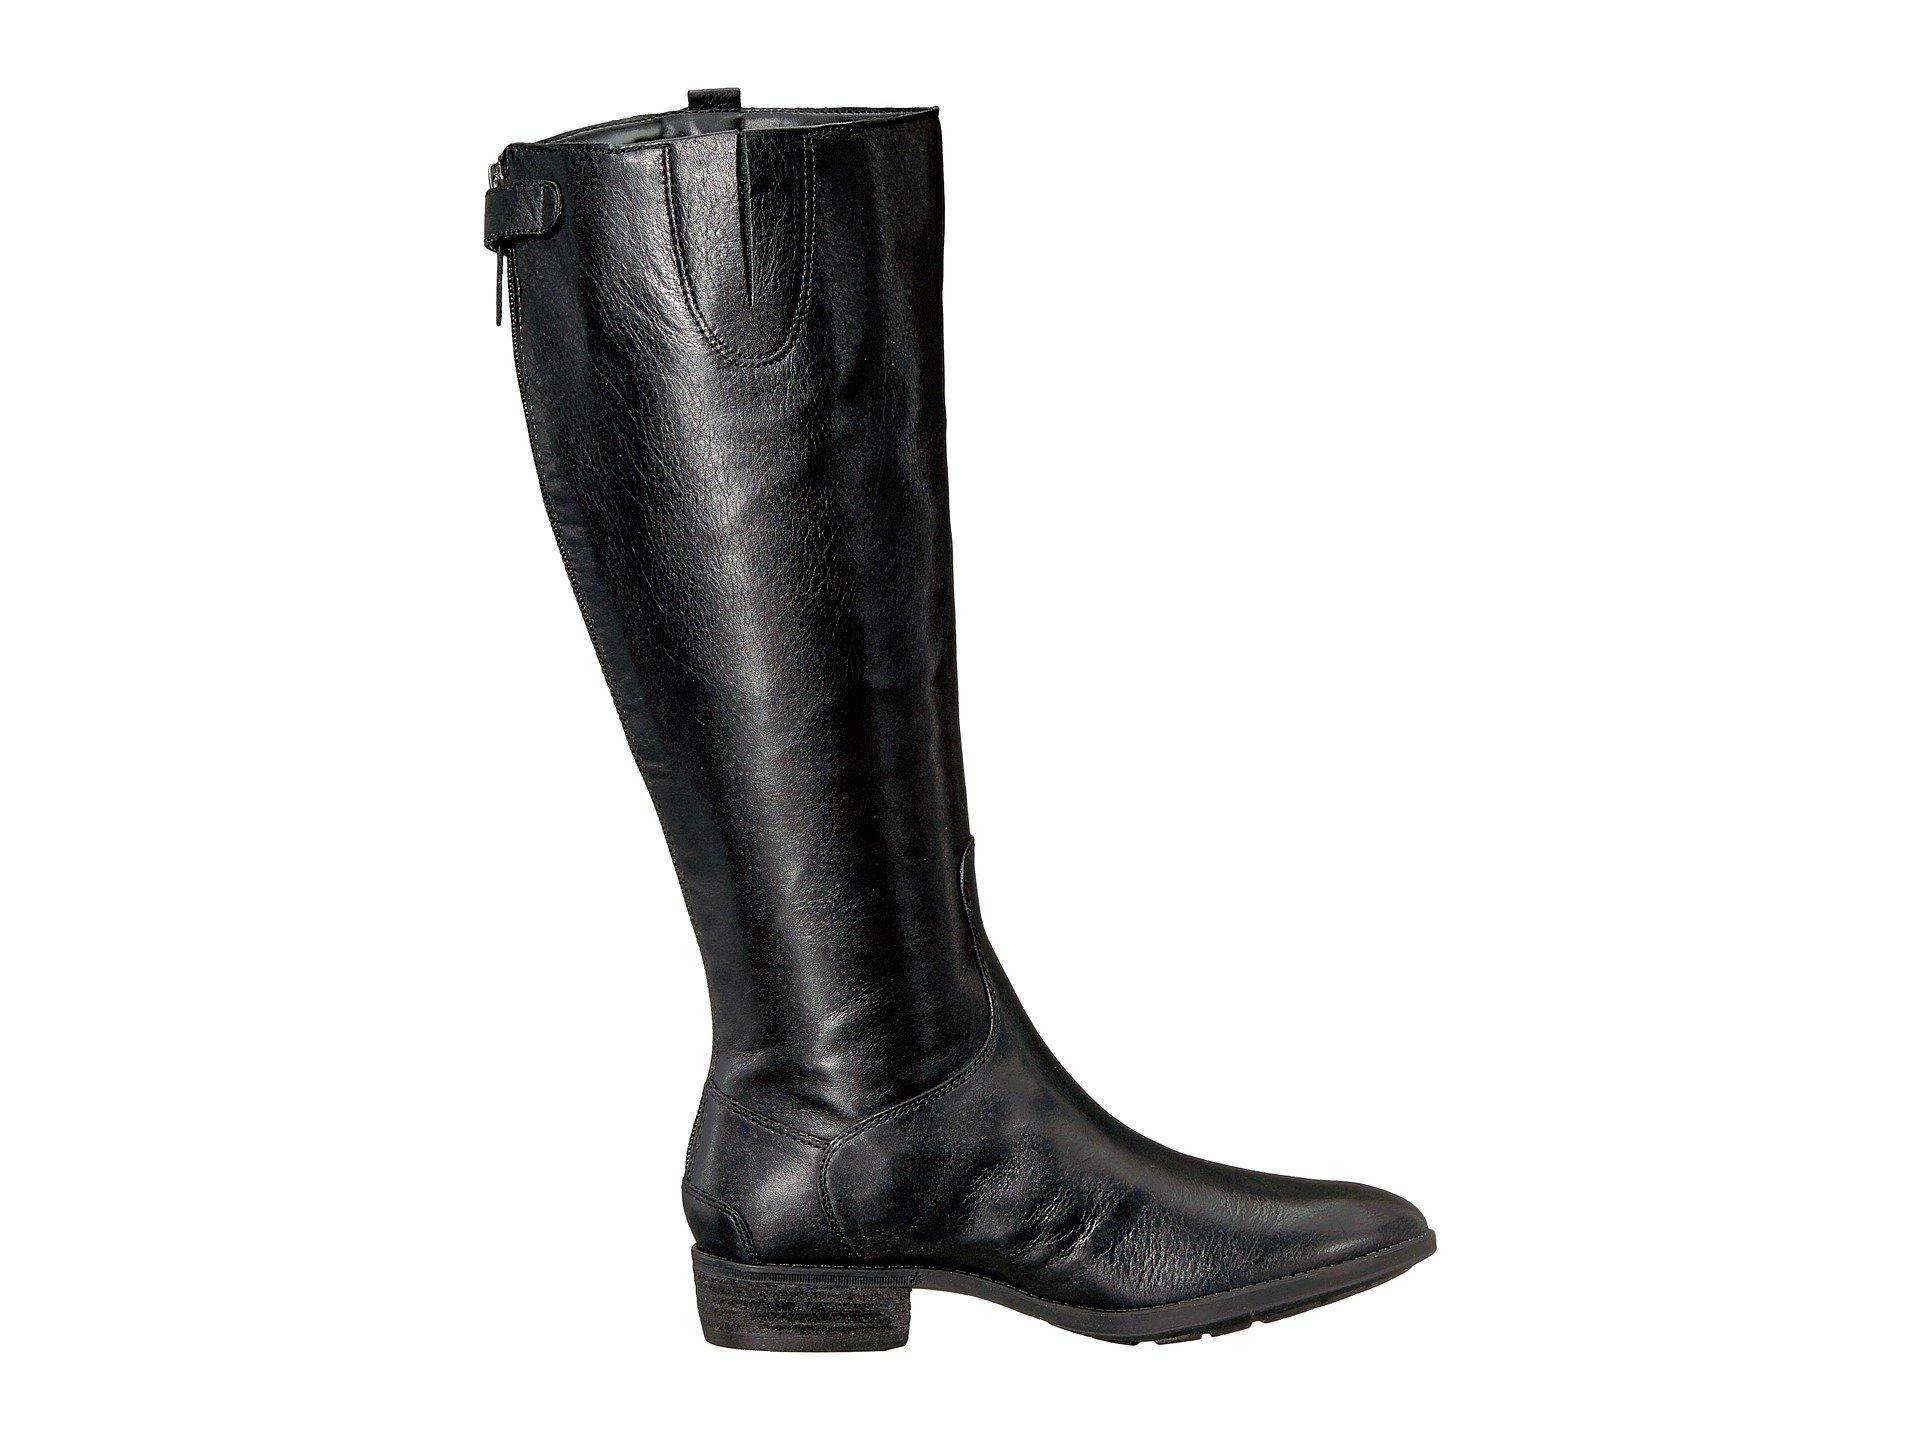 Black Penny Wide Riding Sam Leather Edelman Calf 2 Boot T8xqx7B